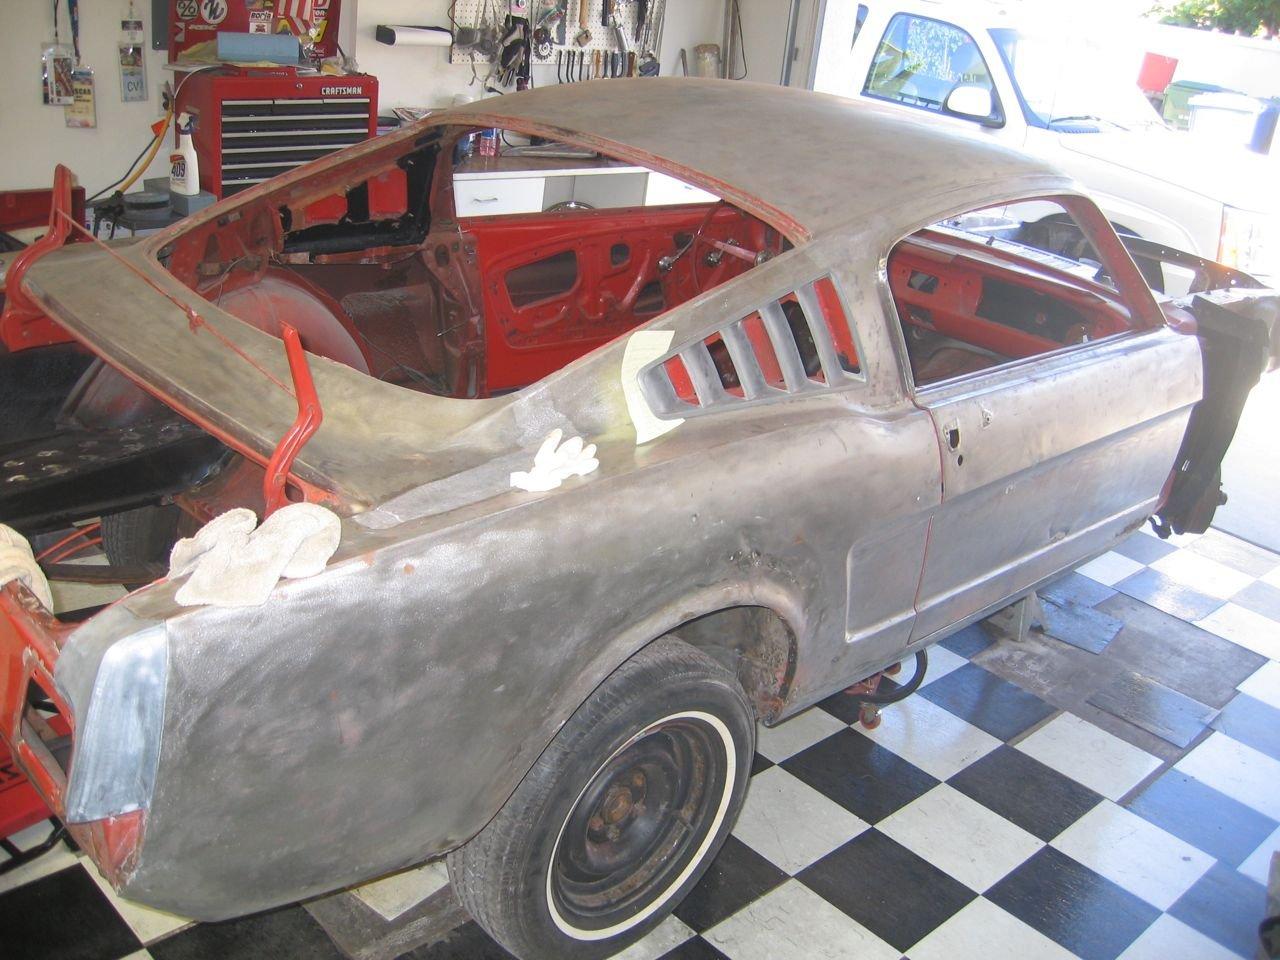 Car Paint Job Cost >> 1965 mustang caspian blue paint job cost - Ford Mustang Forum